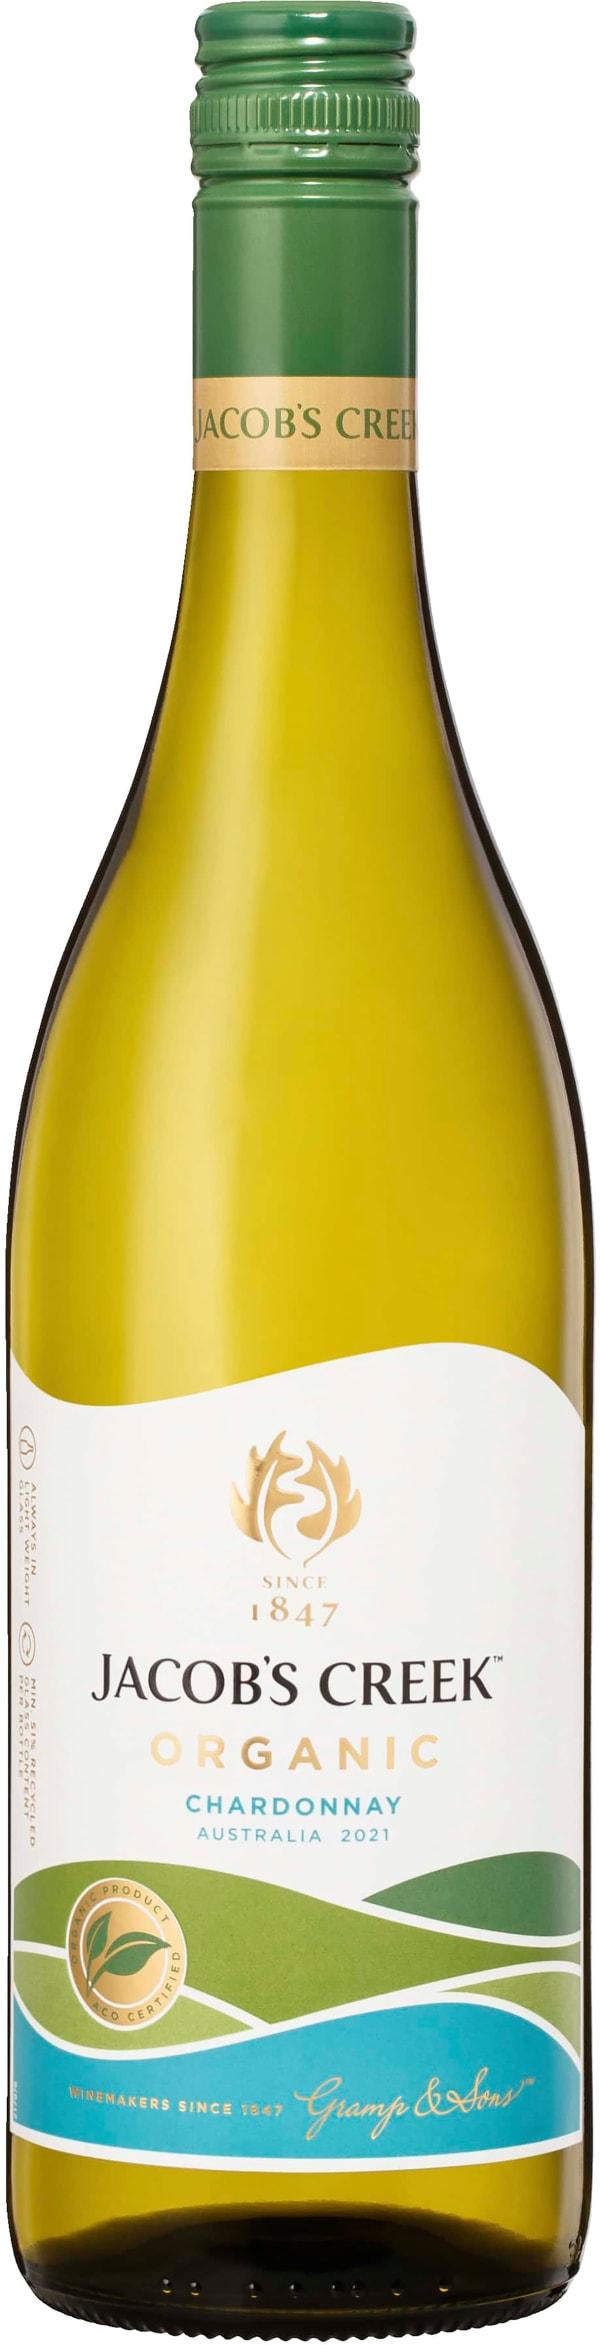 Jacob's Creek Organic Chardonnay 2017